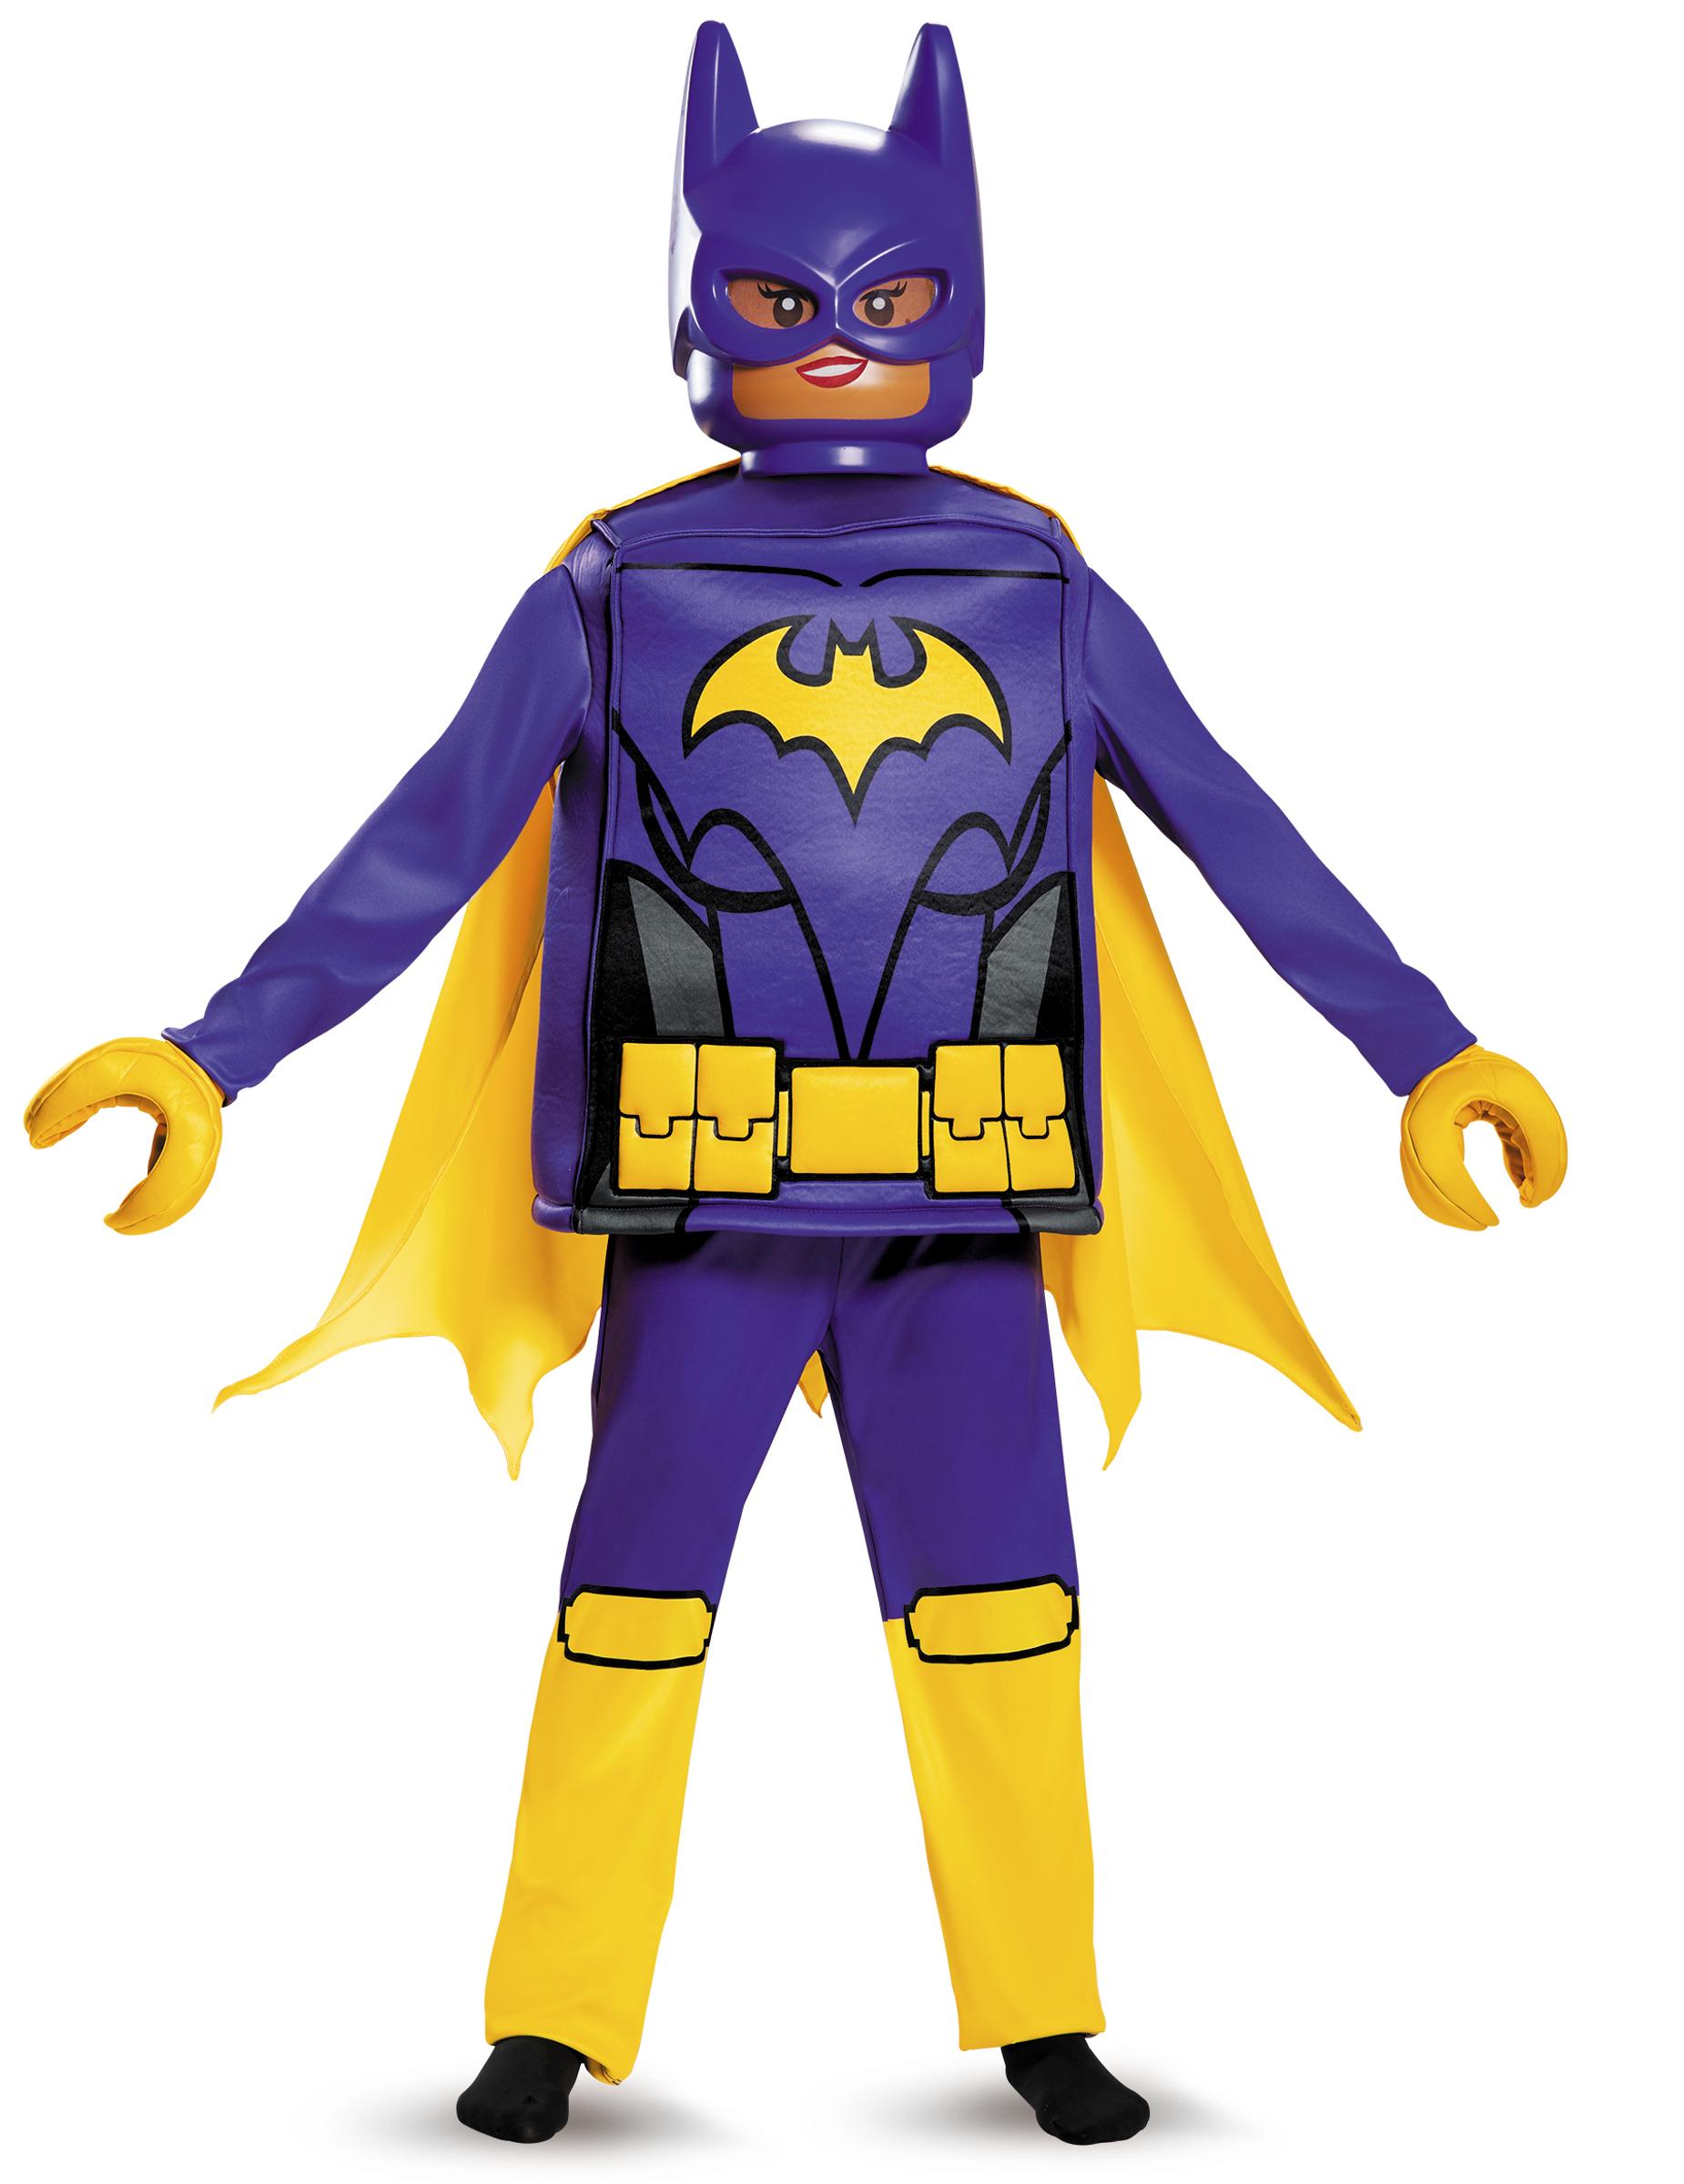 Costume deluxe Batgirl lego movie™ per bambina 59222c8c48c